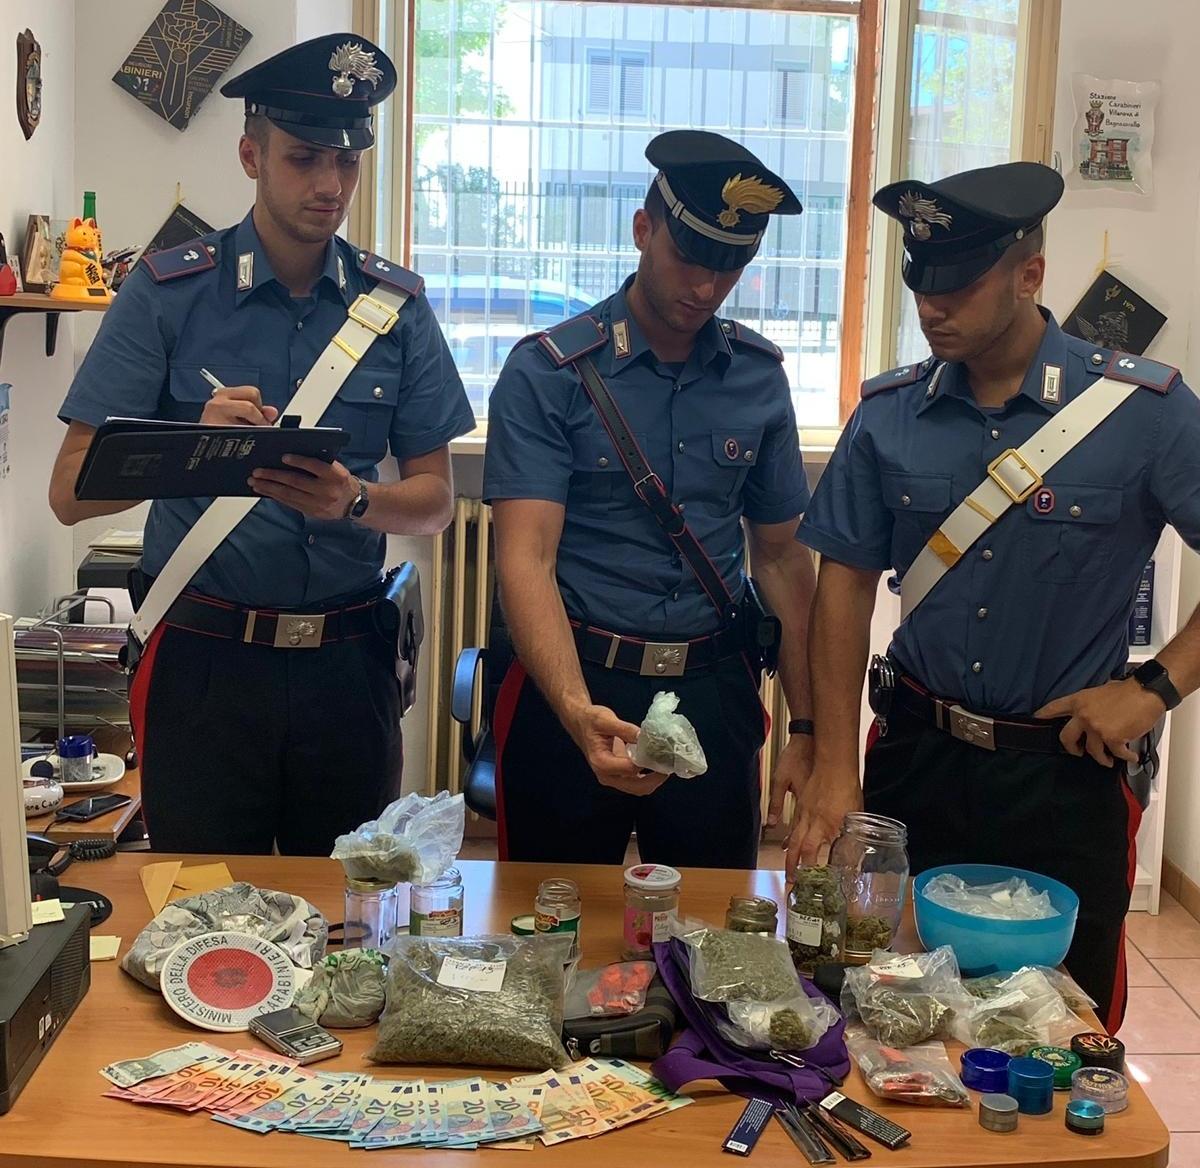 Droga, sei studenti forlivesi nei guai a Ravenna